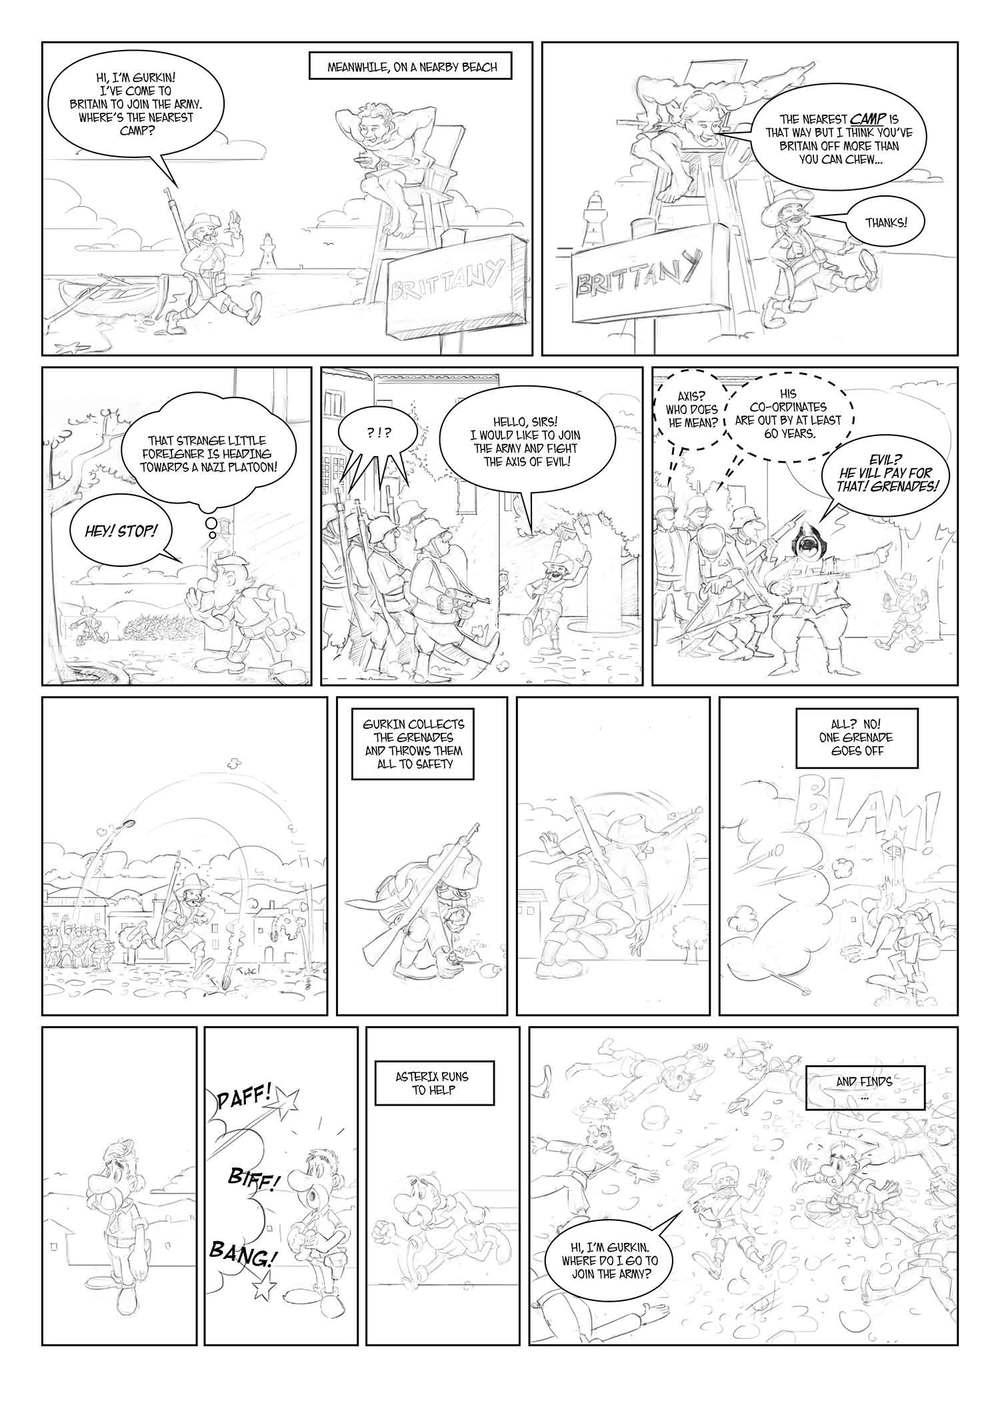 Asterix vs Hitler part 2